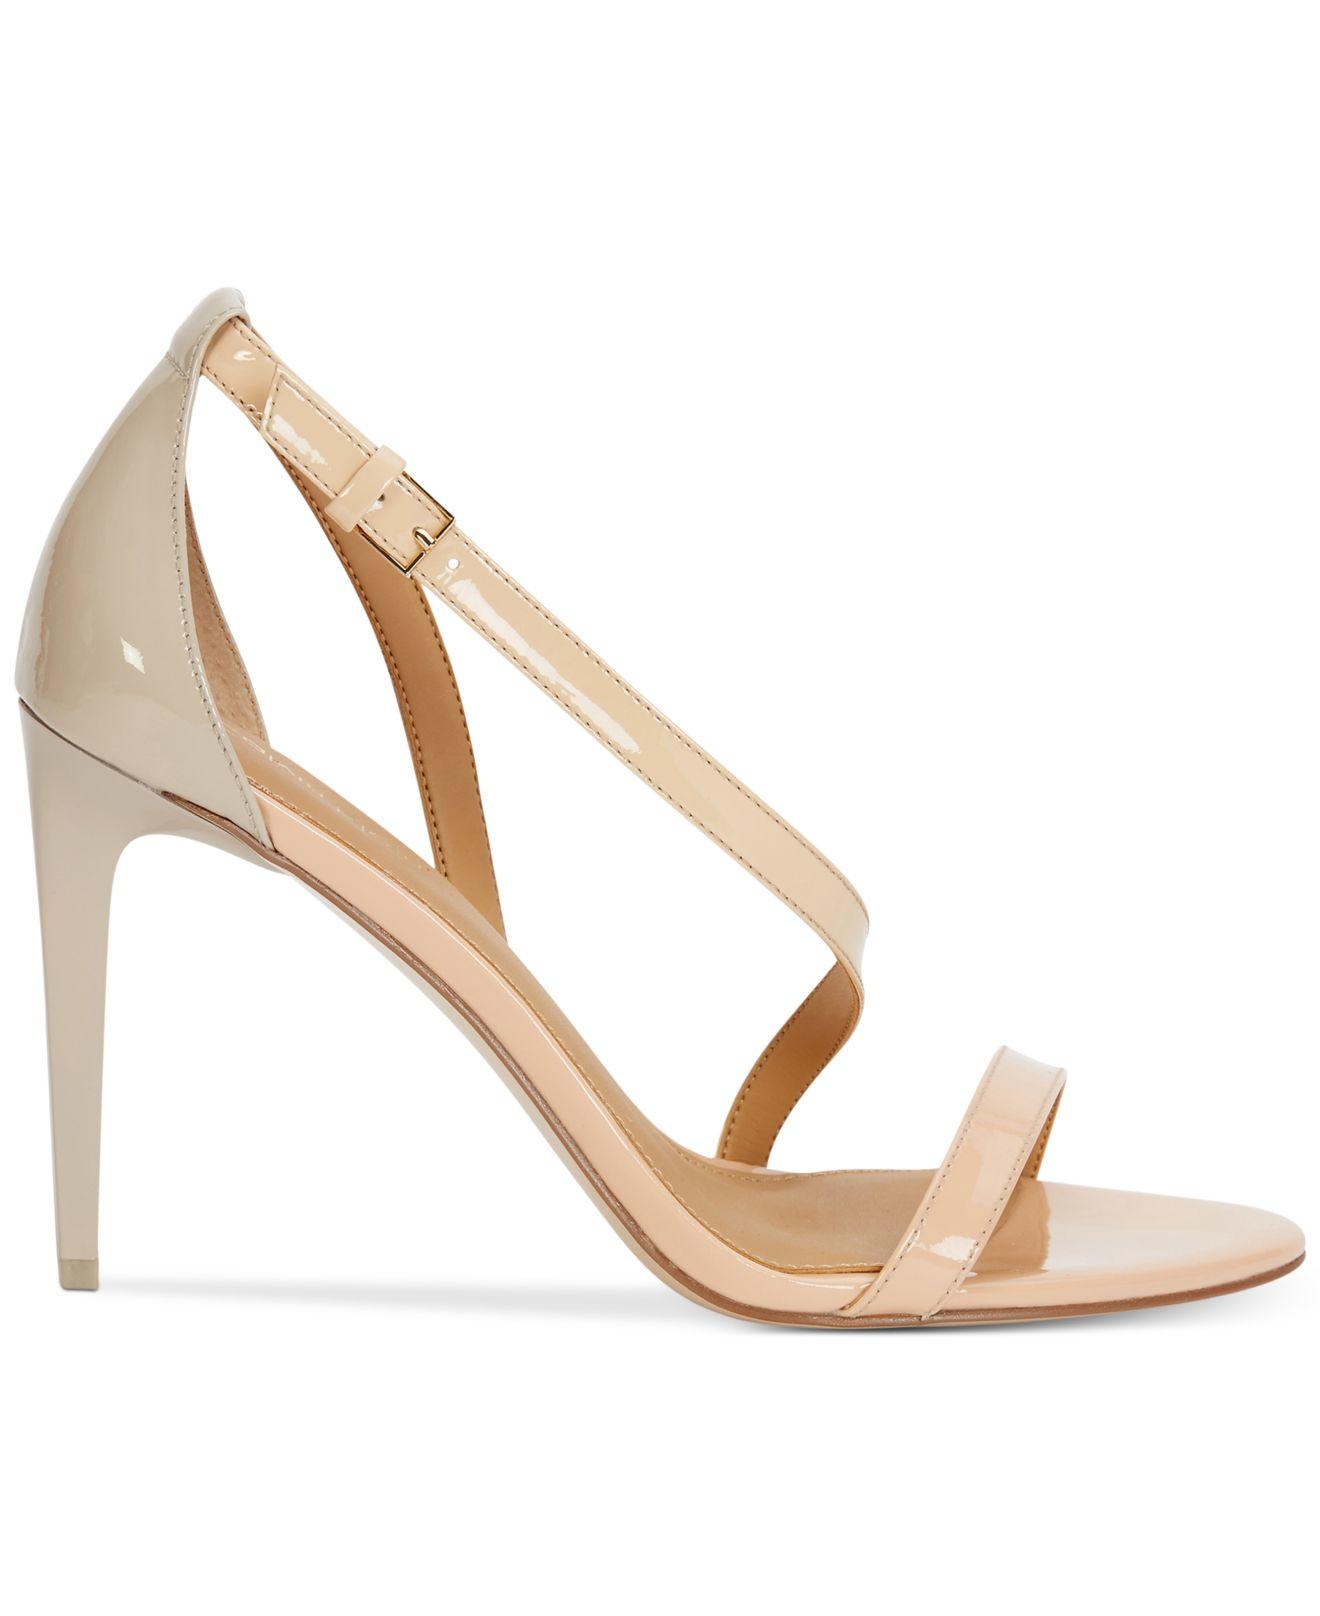 820396ce72e Lyst - Calvin Klein Women s Narella Colorblocked Dress Sandals in ...